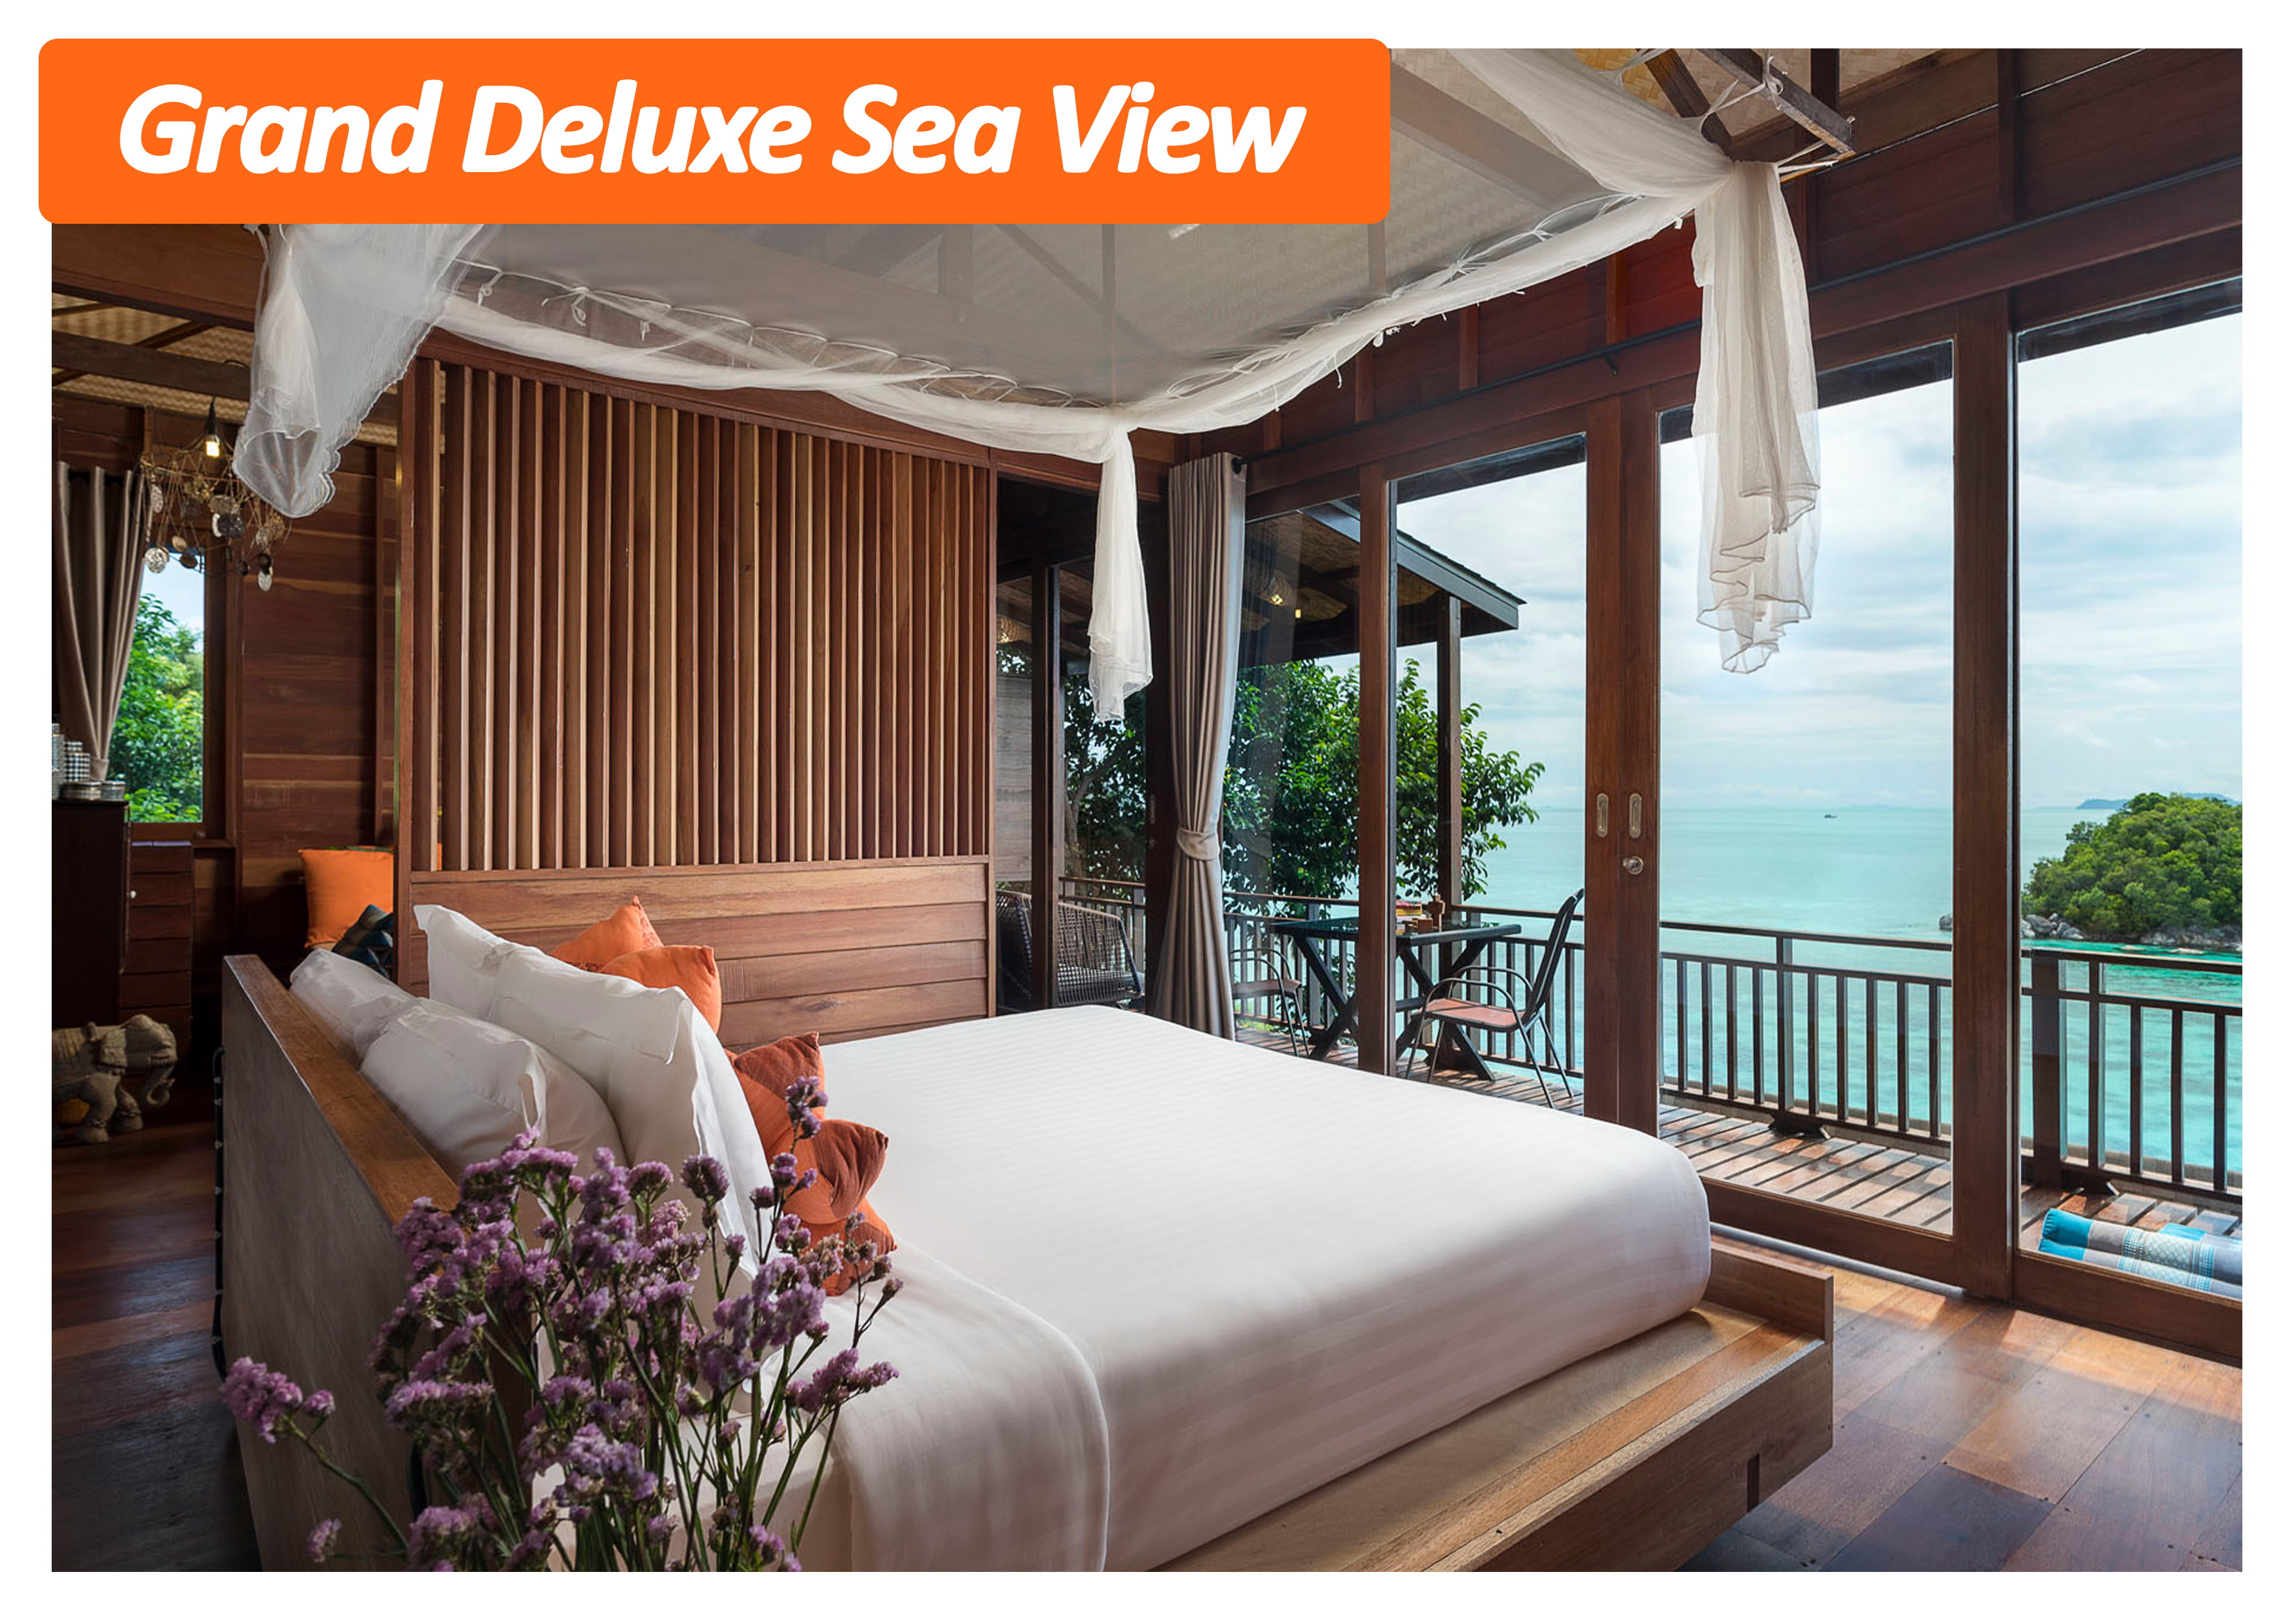 Grand Deluxe Sea View | serendipity resort